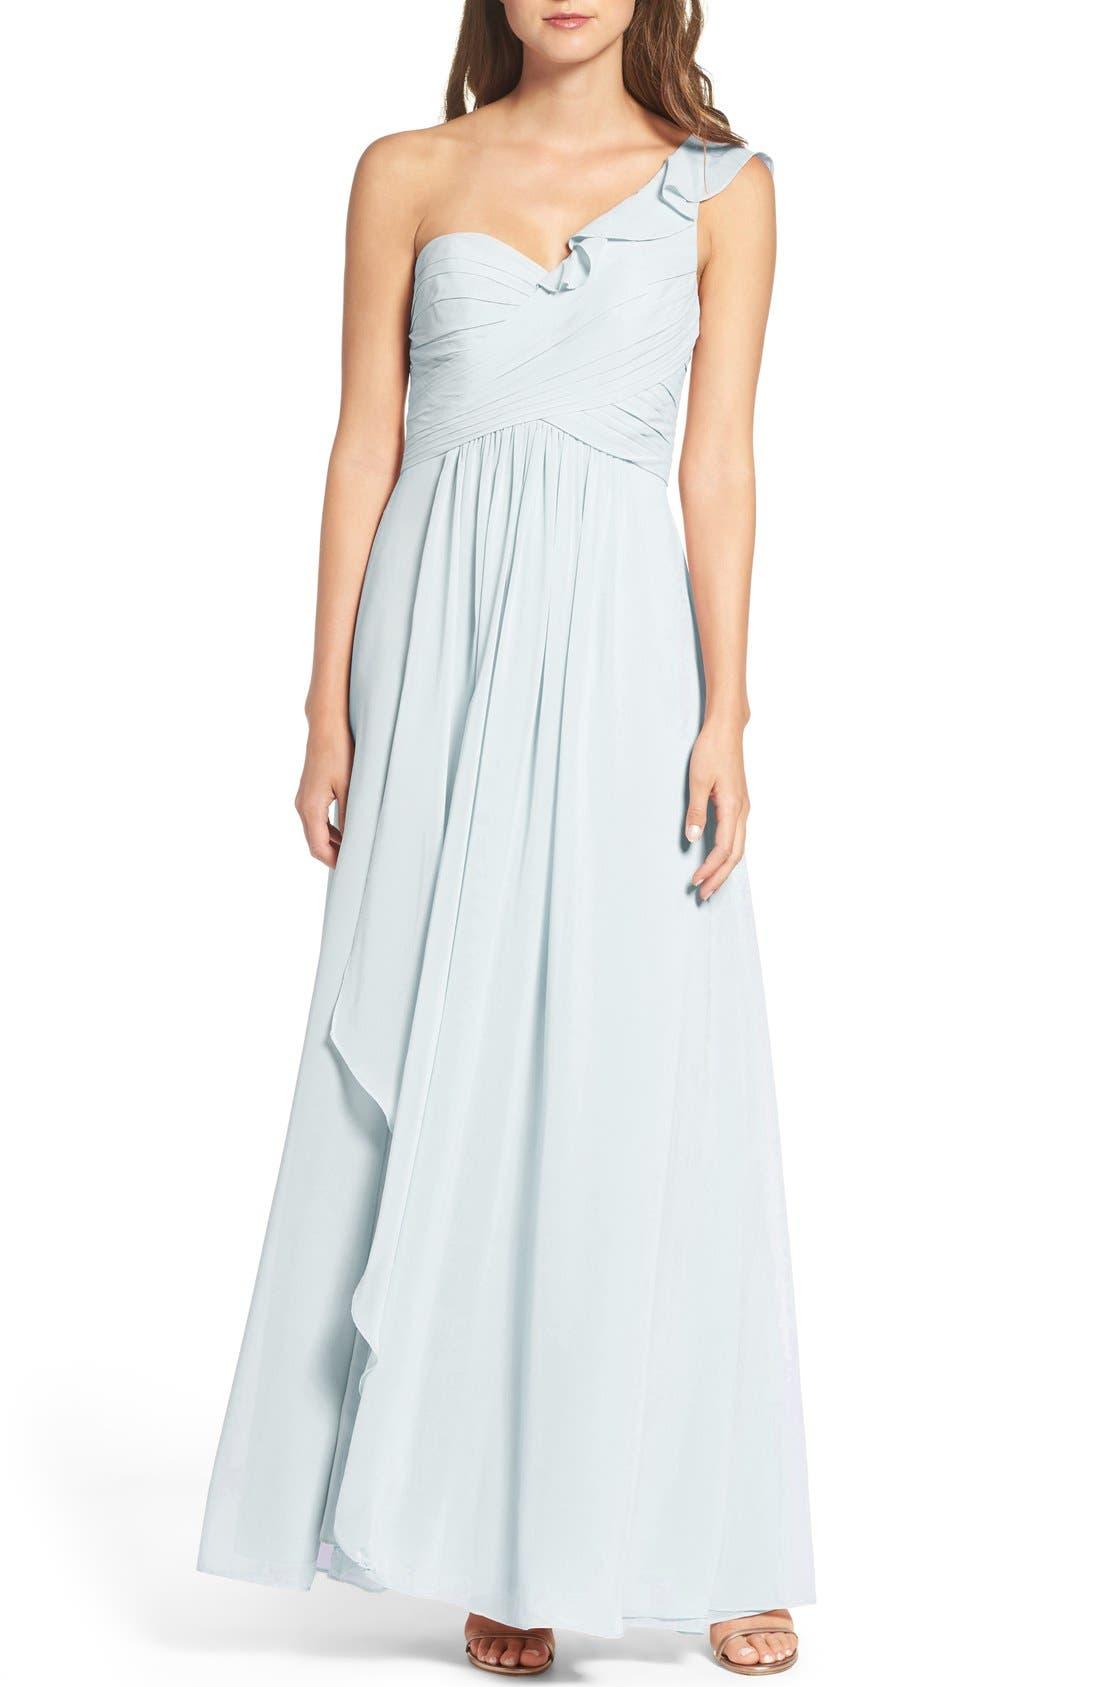 One-Shoulder Chiffon Dress,                             Main thumbnail 1, color,                             400